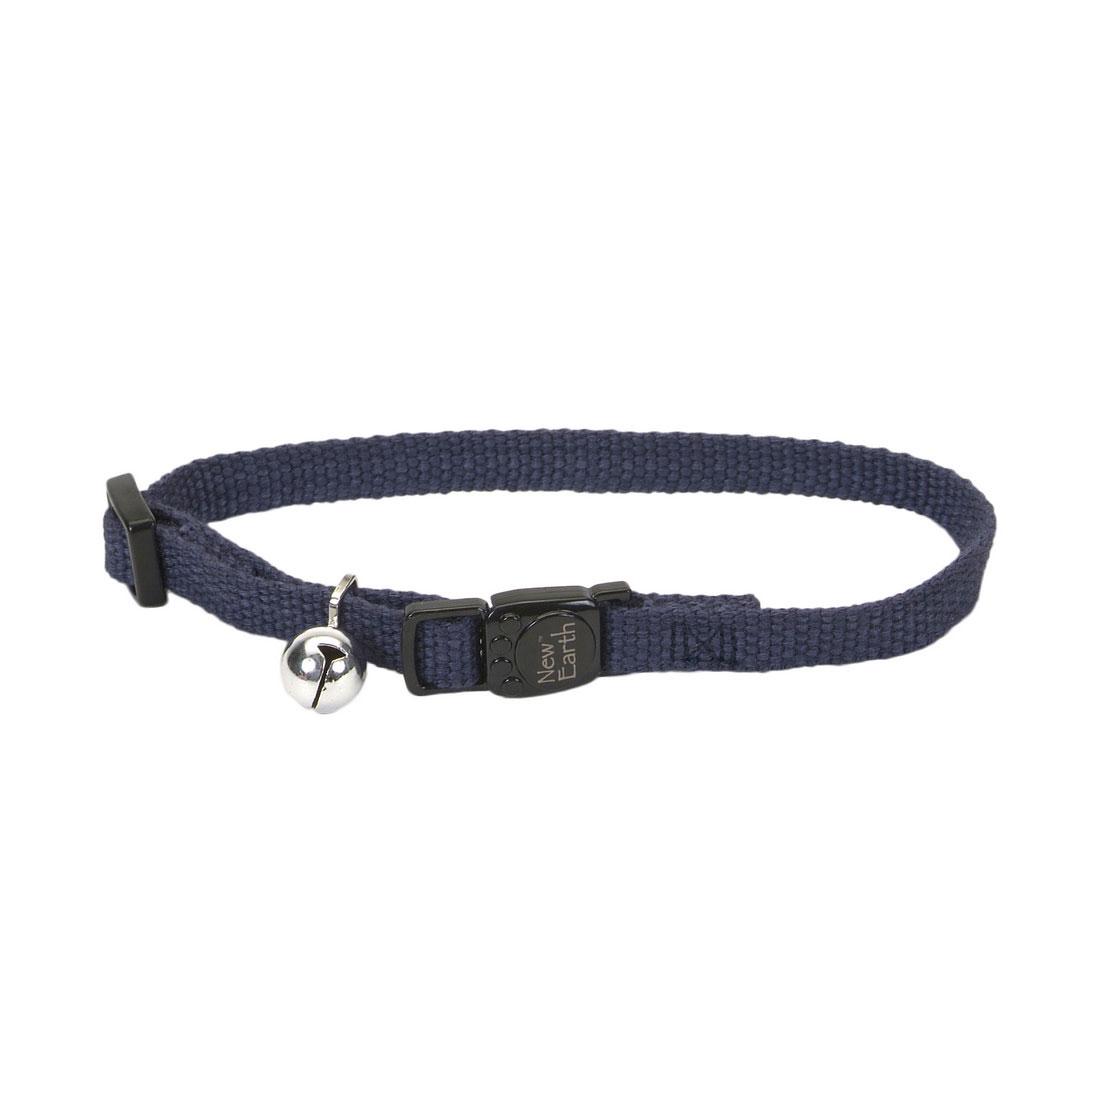 Coastal Pet New Earth Soy Adjustable Breakaway Cat Collar, Indigo, 8-12-in